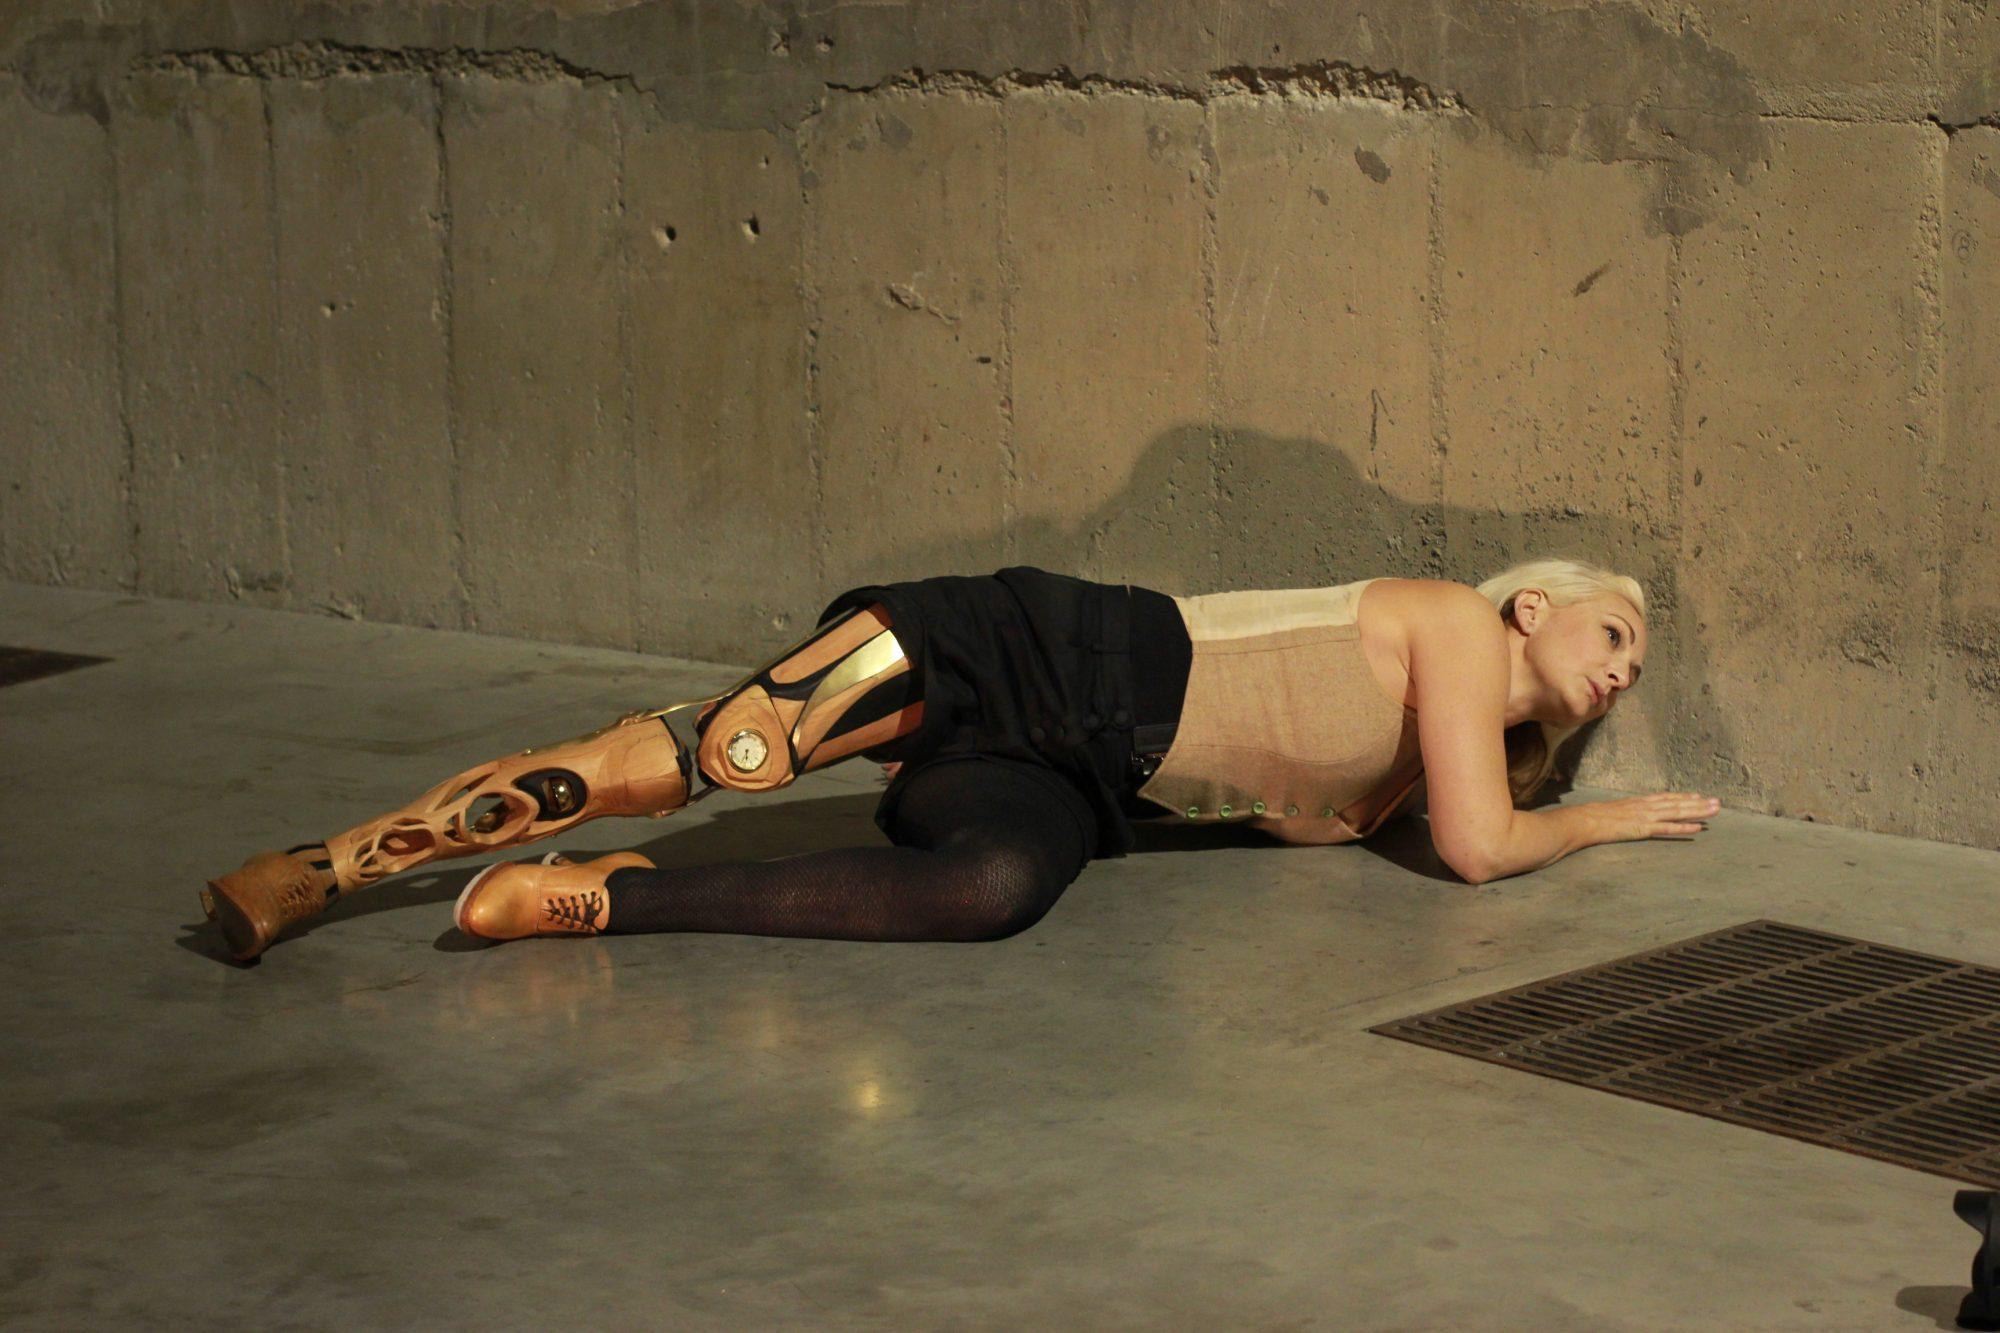 The Alternative Limb Project, photography by Becky Dann 18